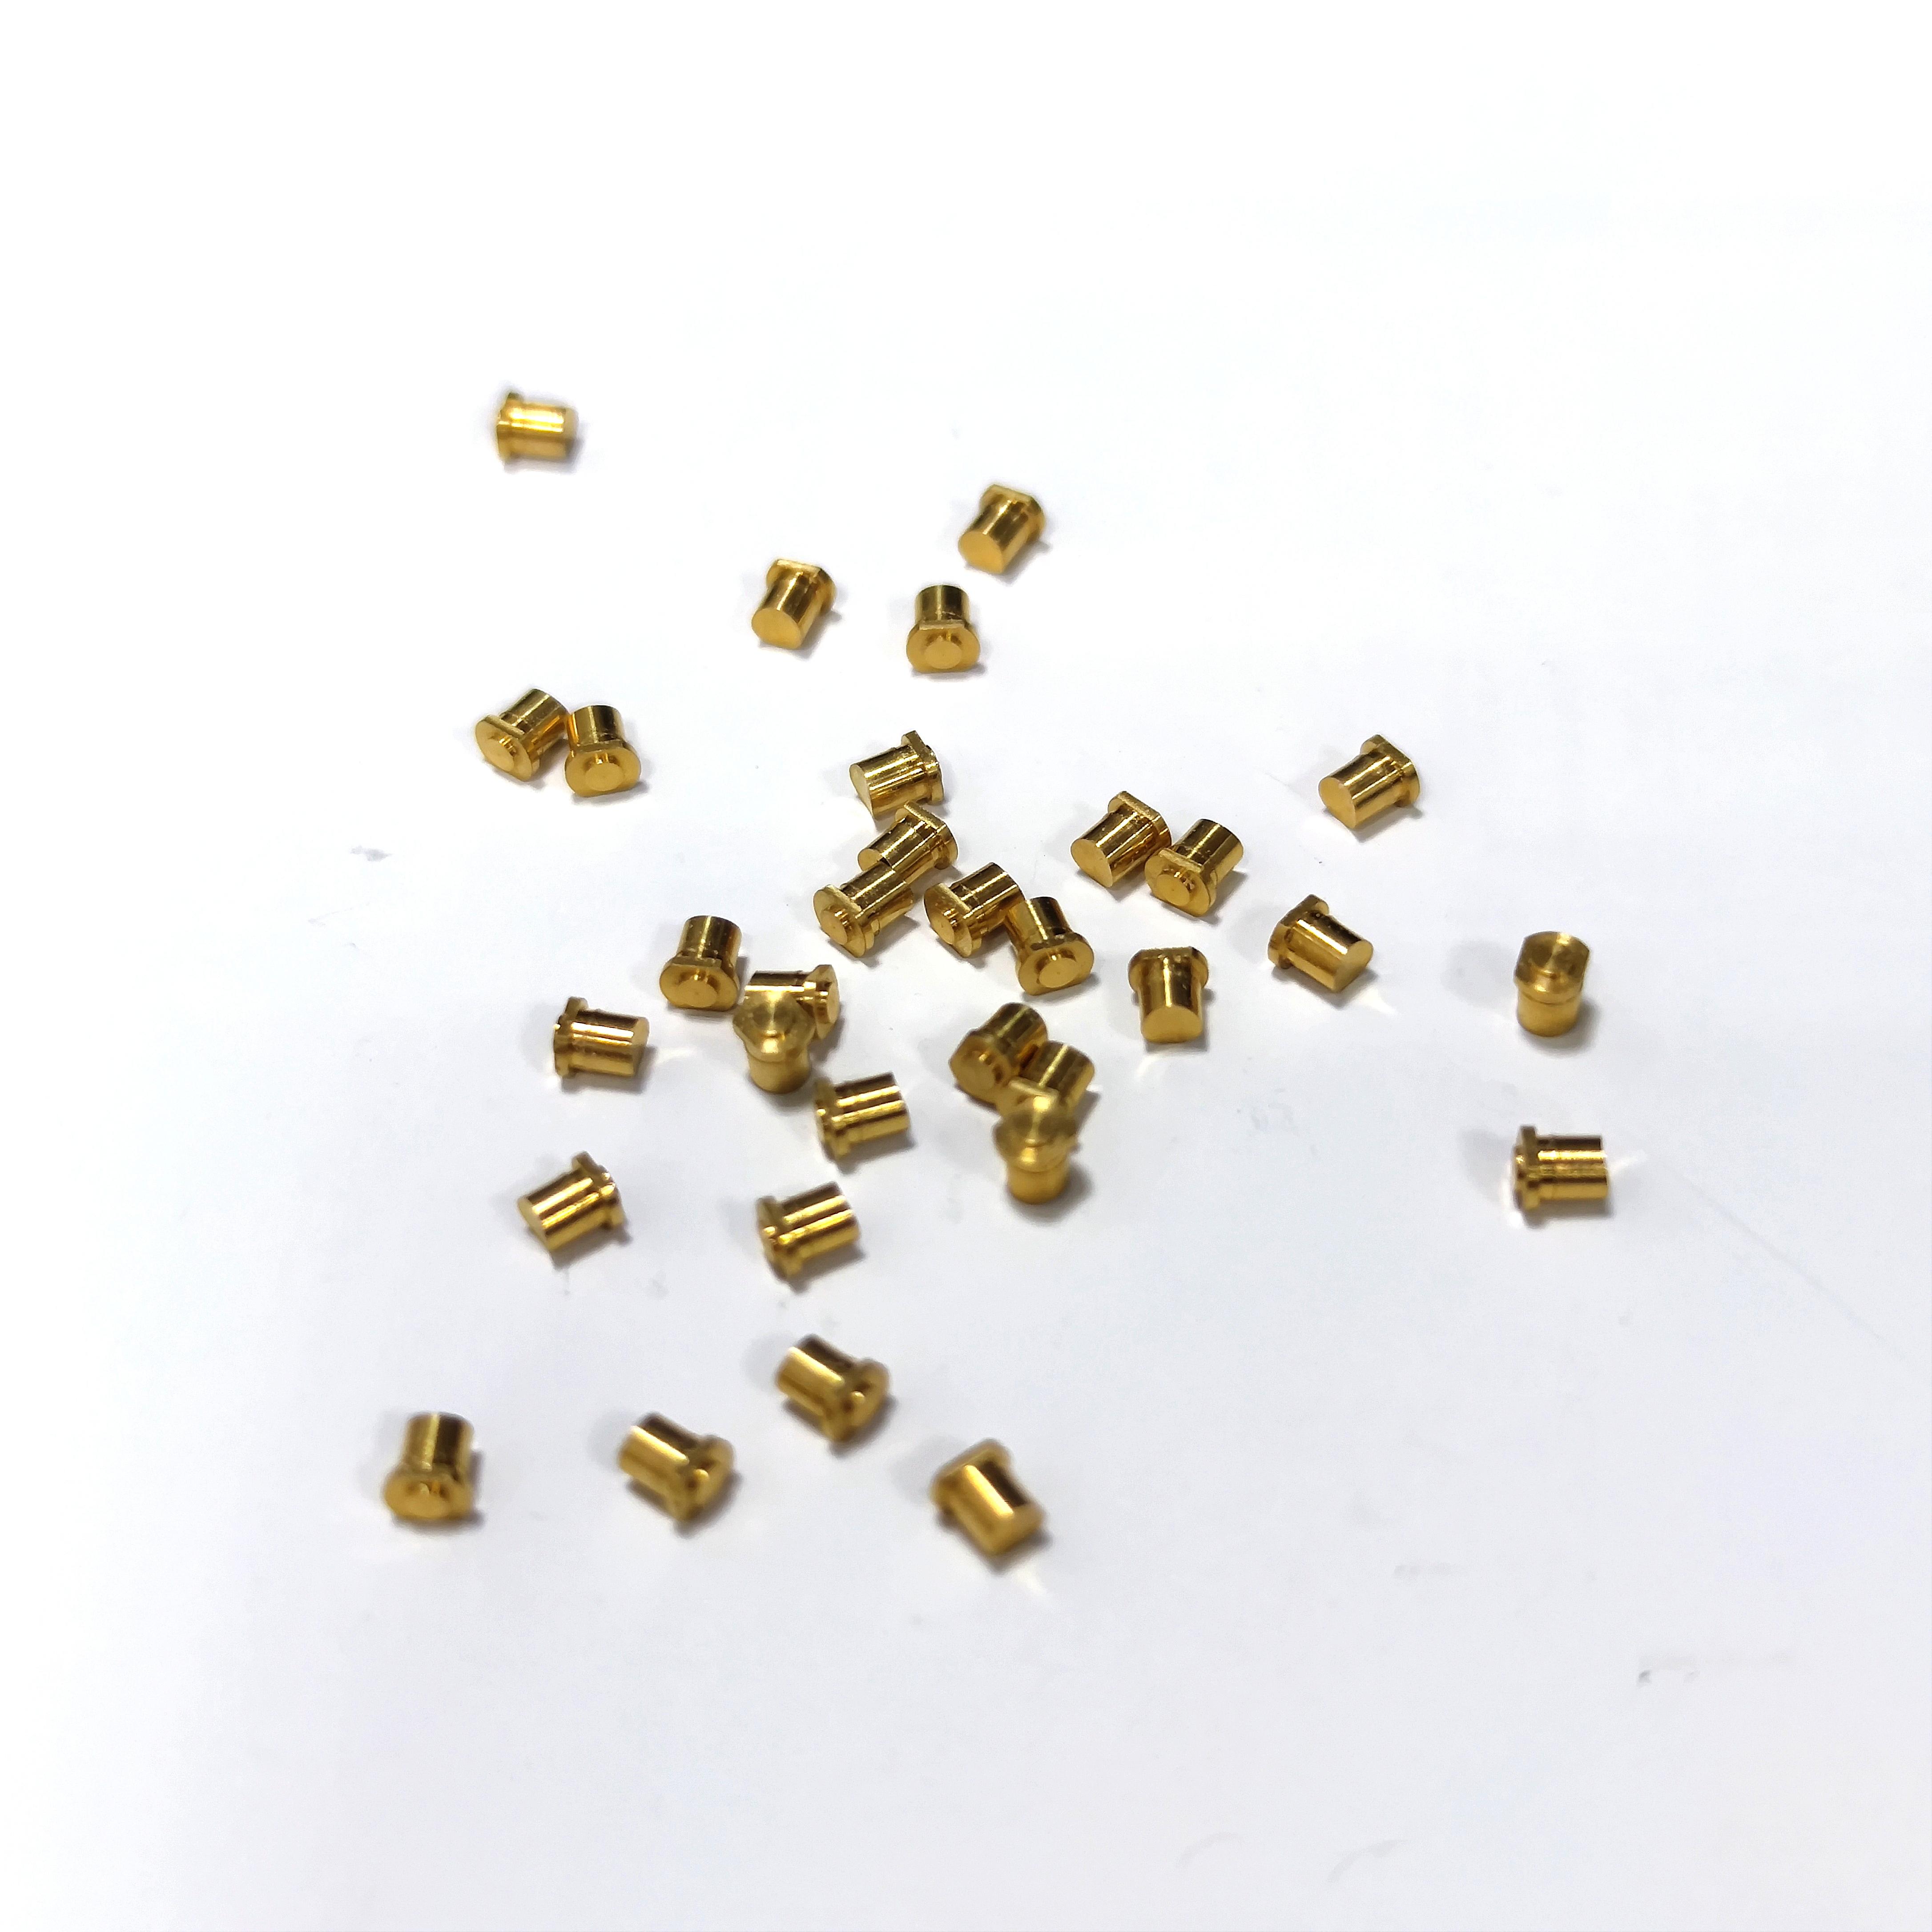 Lathe CNC precision machining part/fastener auto lathe turning part